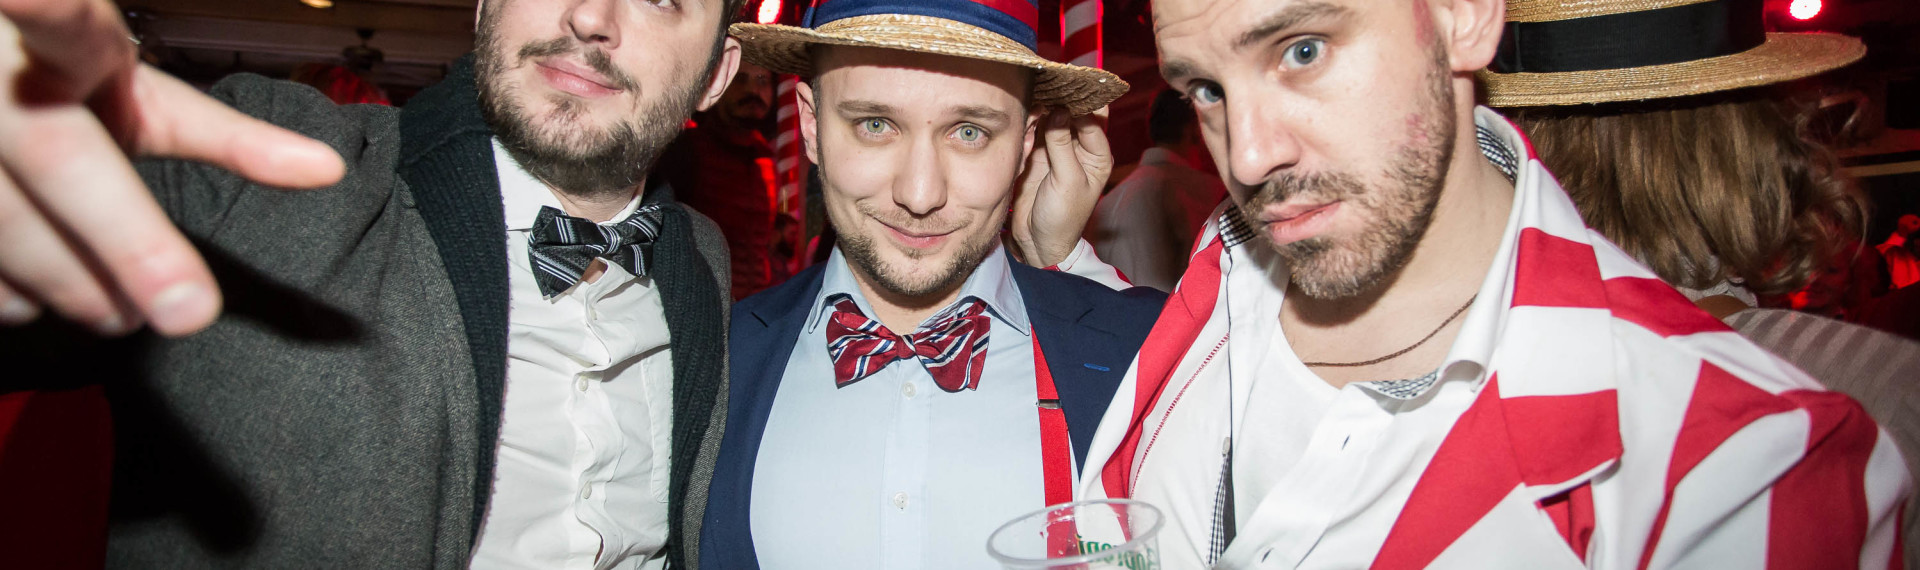 DIE ultimative JGA-Partynacht in Berlin